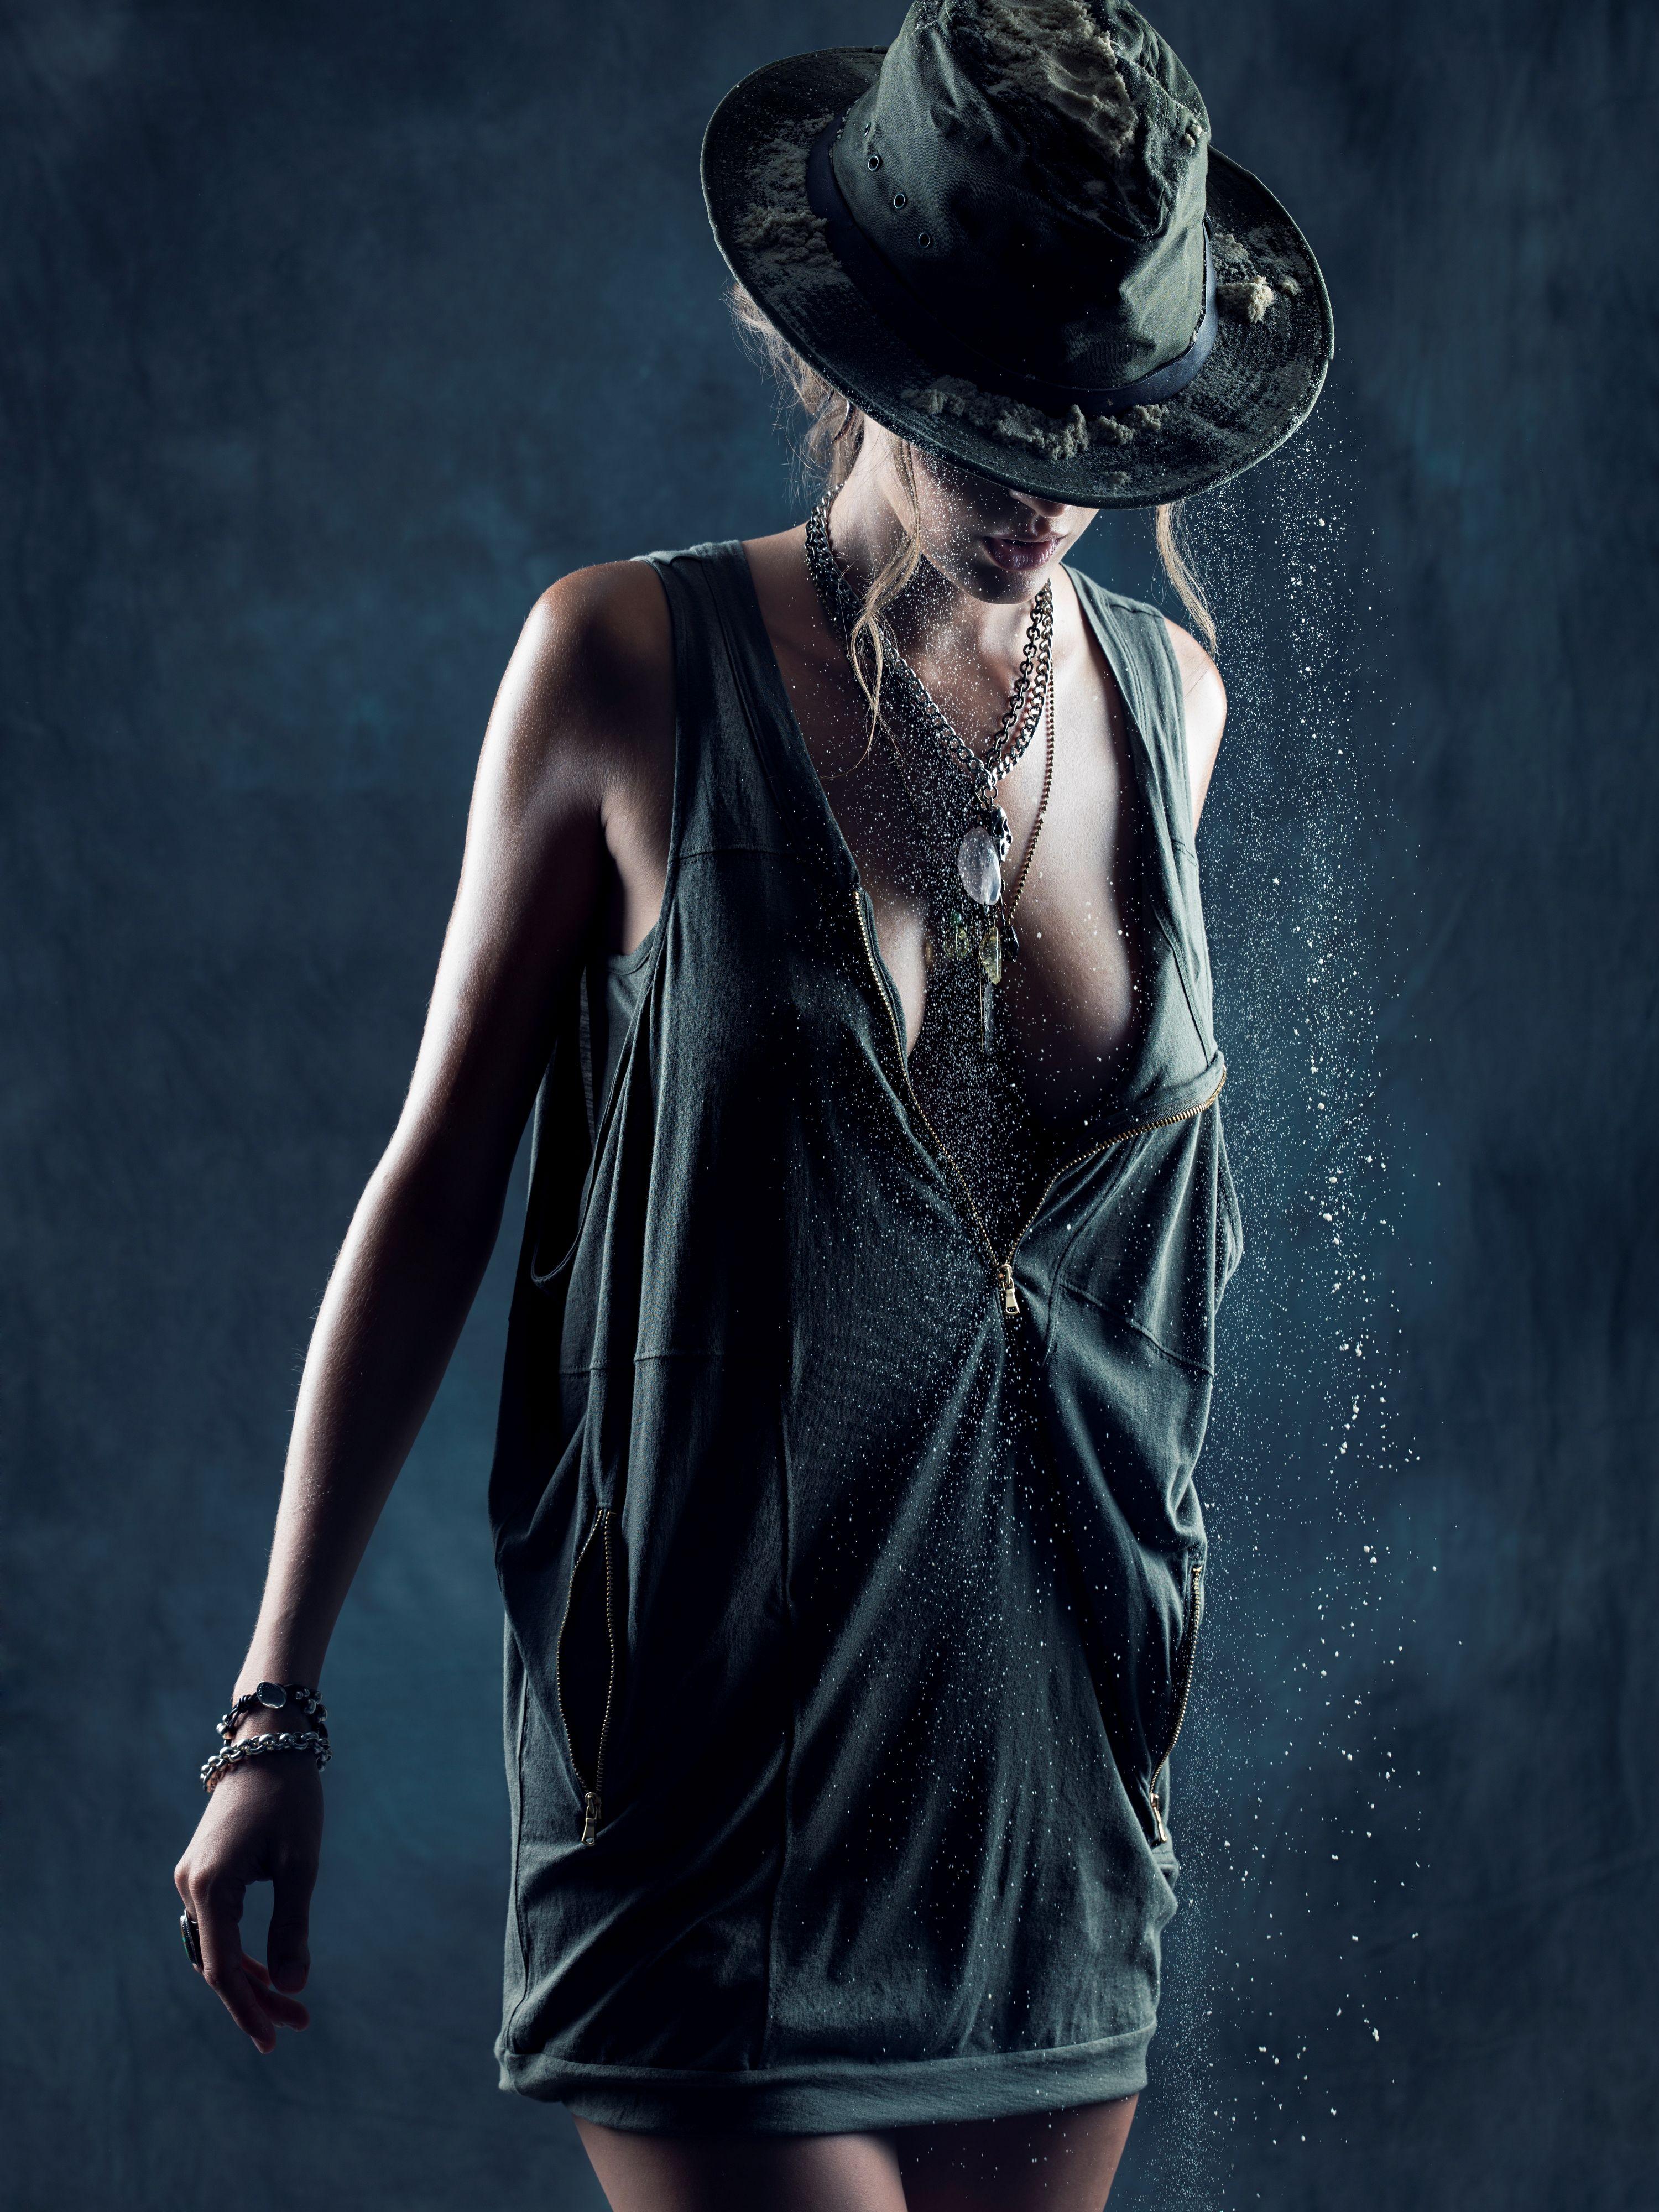 Katelyn Pascavis Topless ...